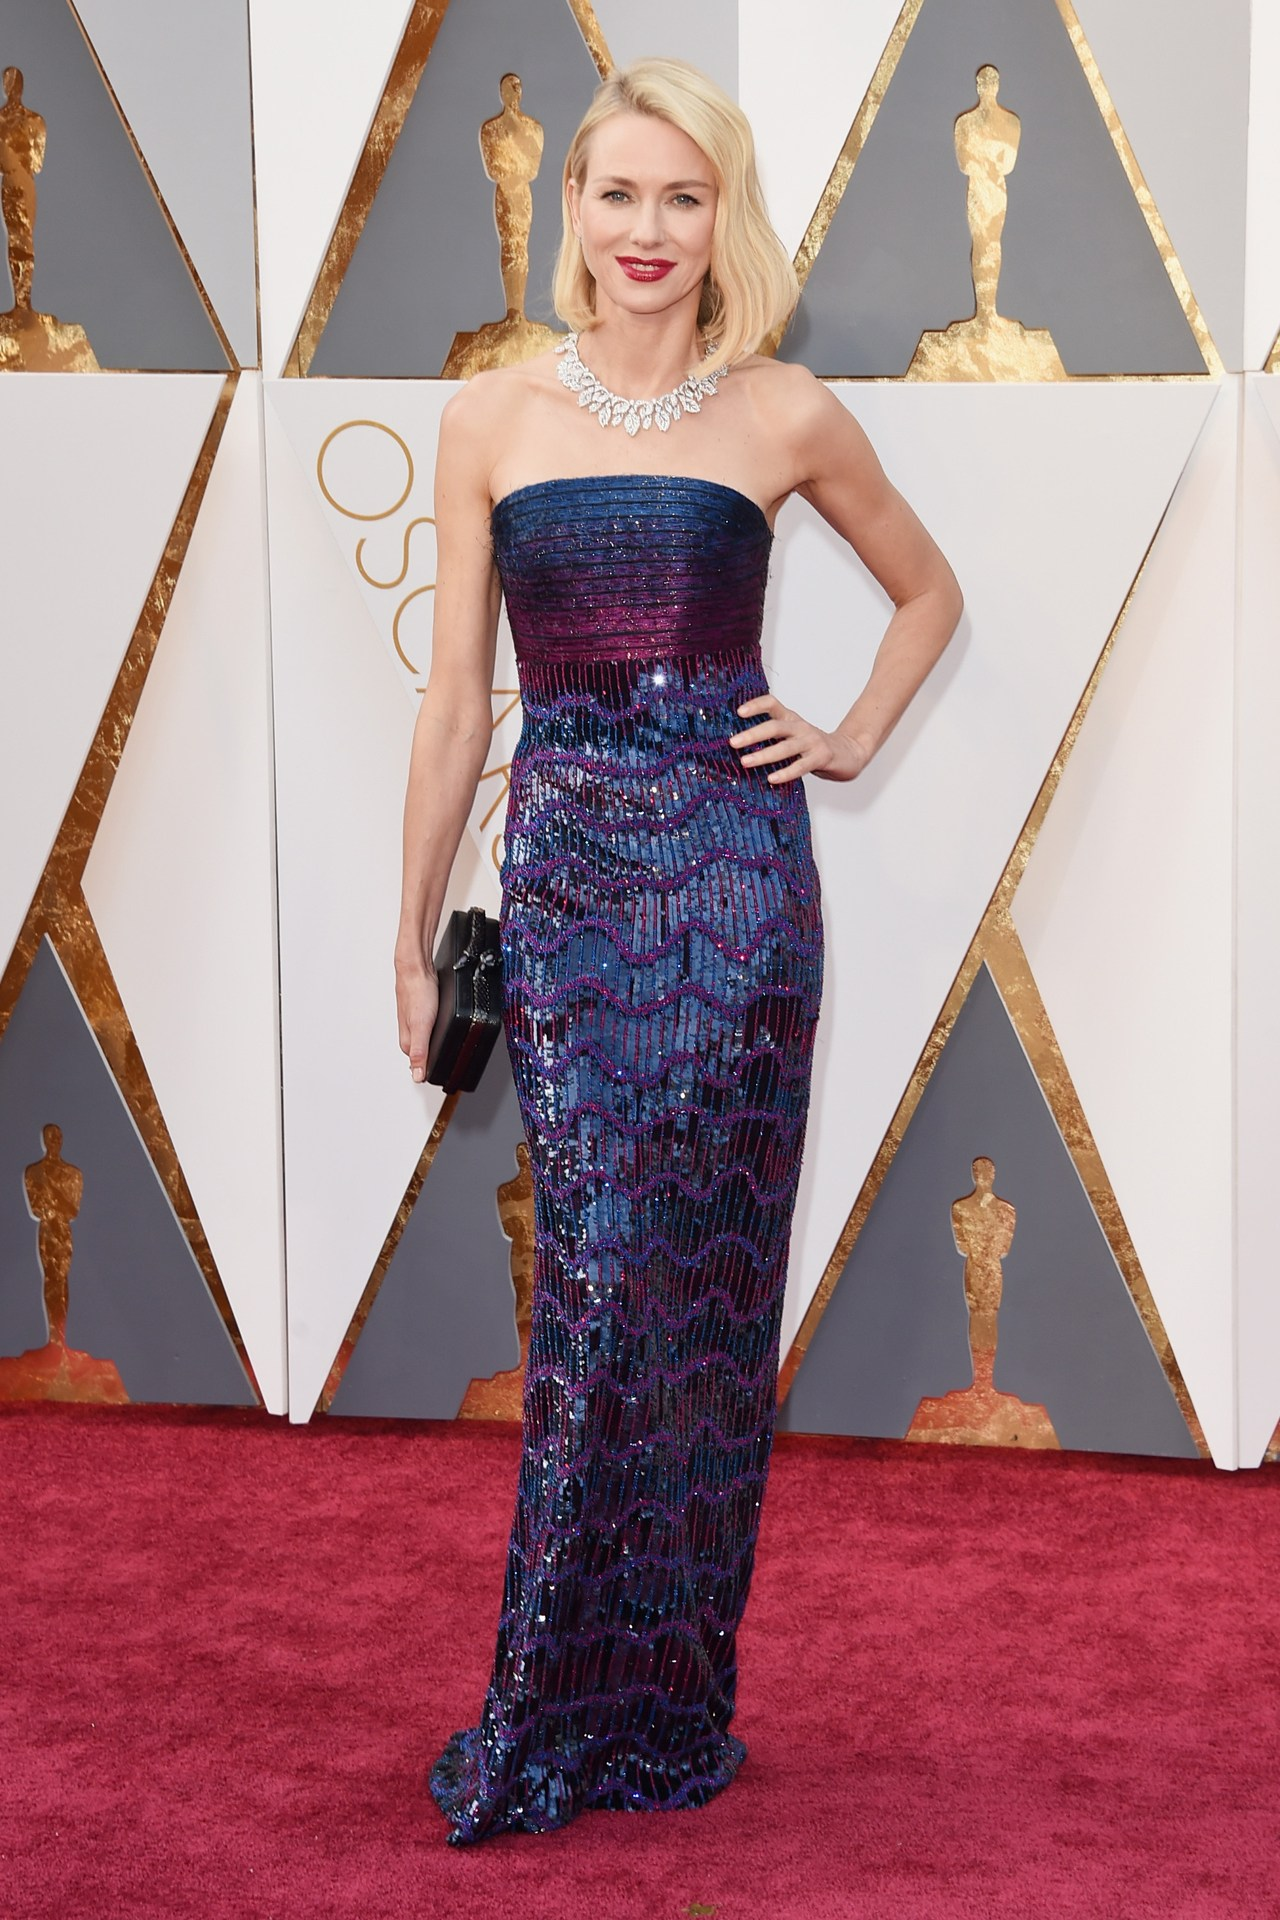 Naomi-Watts-Oscars-2016-Red-Carpet-Louis-Vuitton-Vogue-28Feb16-Getty_b.jpg